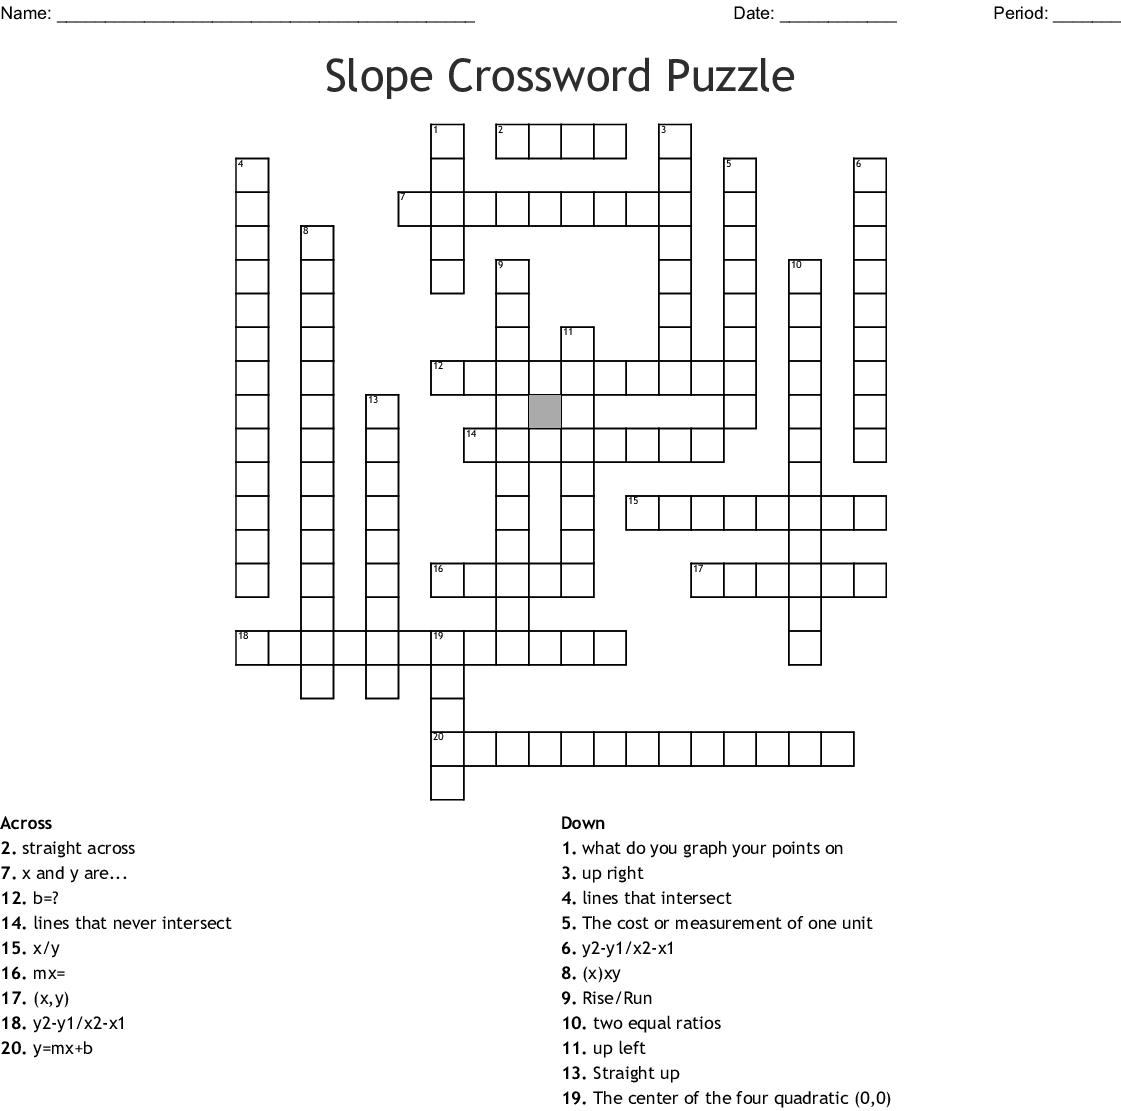 Slope Crossword Puzzle